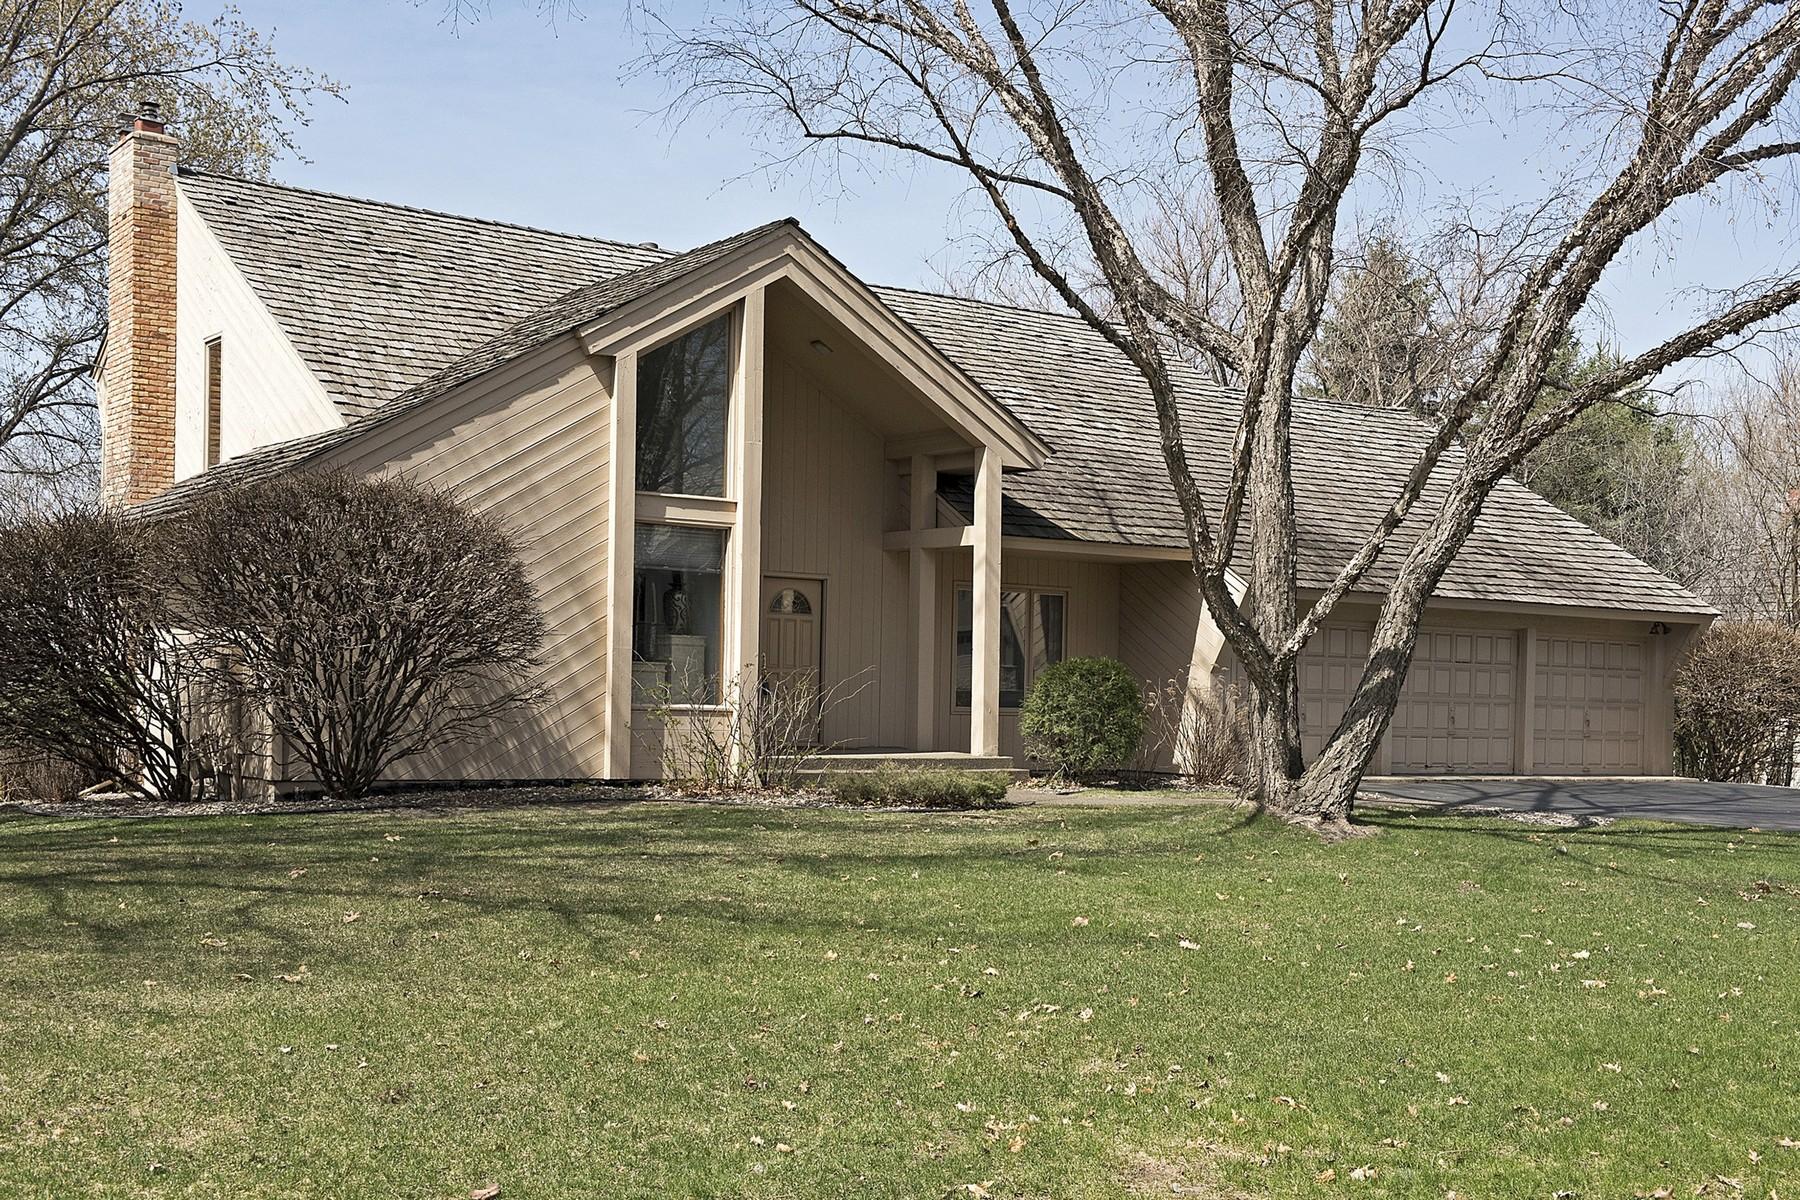 Single Family Home for Sale at 5206 Green Farms Road Edina, Minnesota 55436 United States